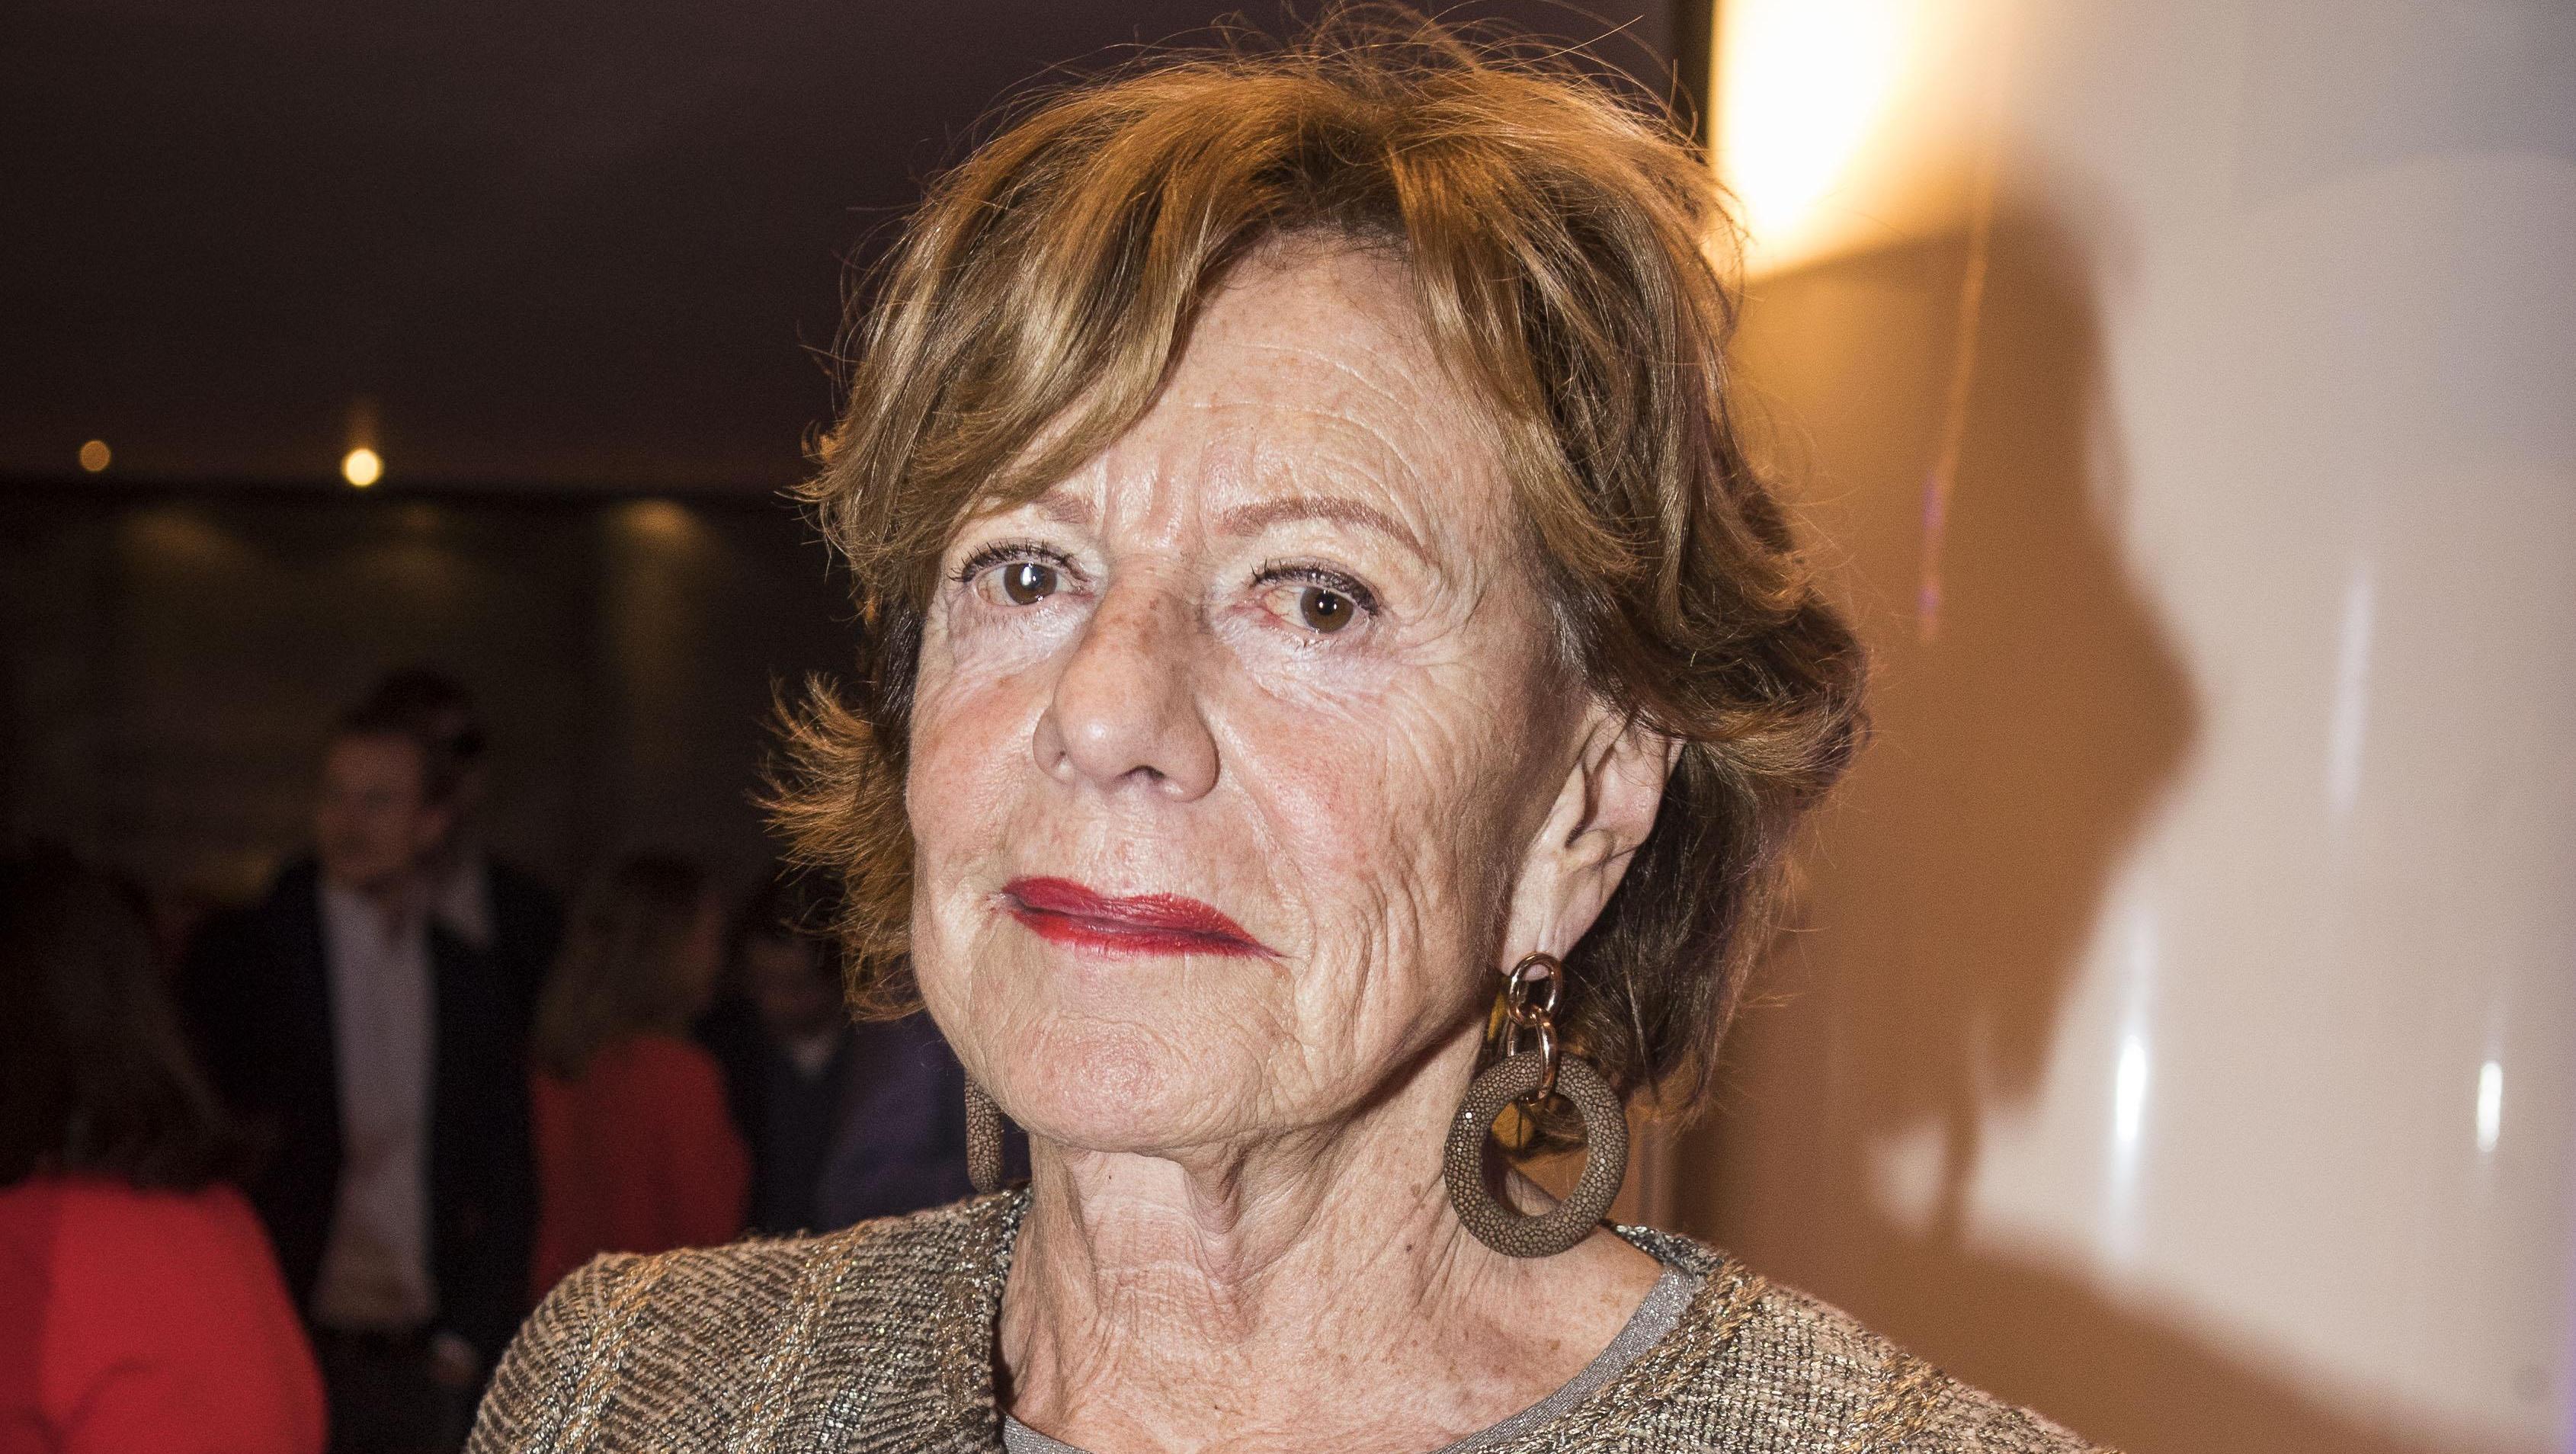 Licht Projector Kinderkamer : Kroes verbaasd over lhbt intolerantie entertainment telegraaf.nl